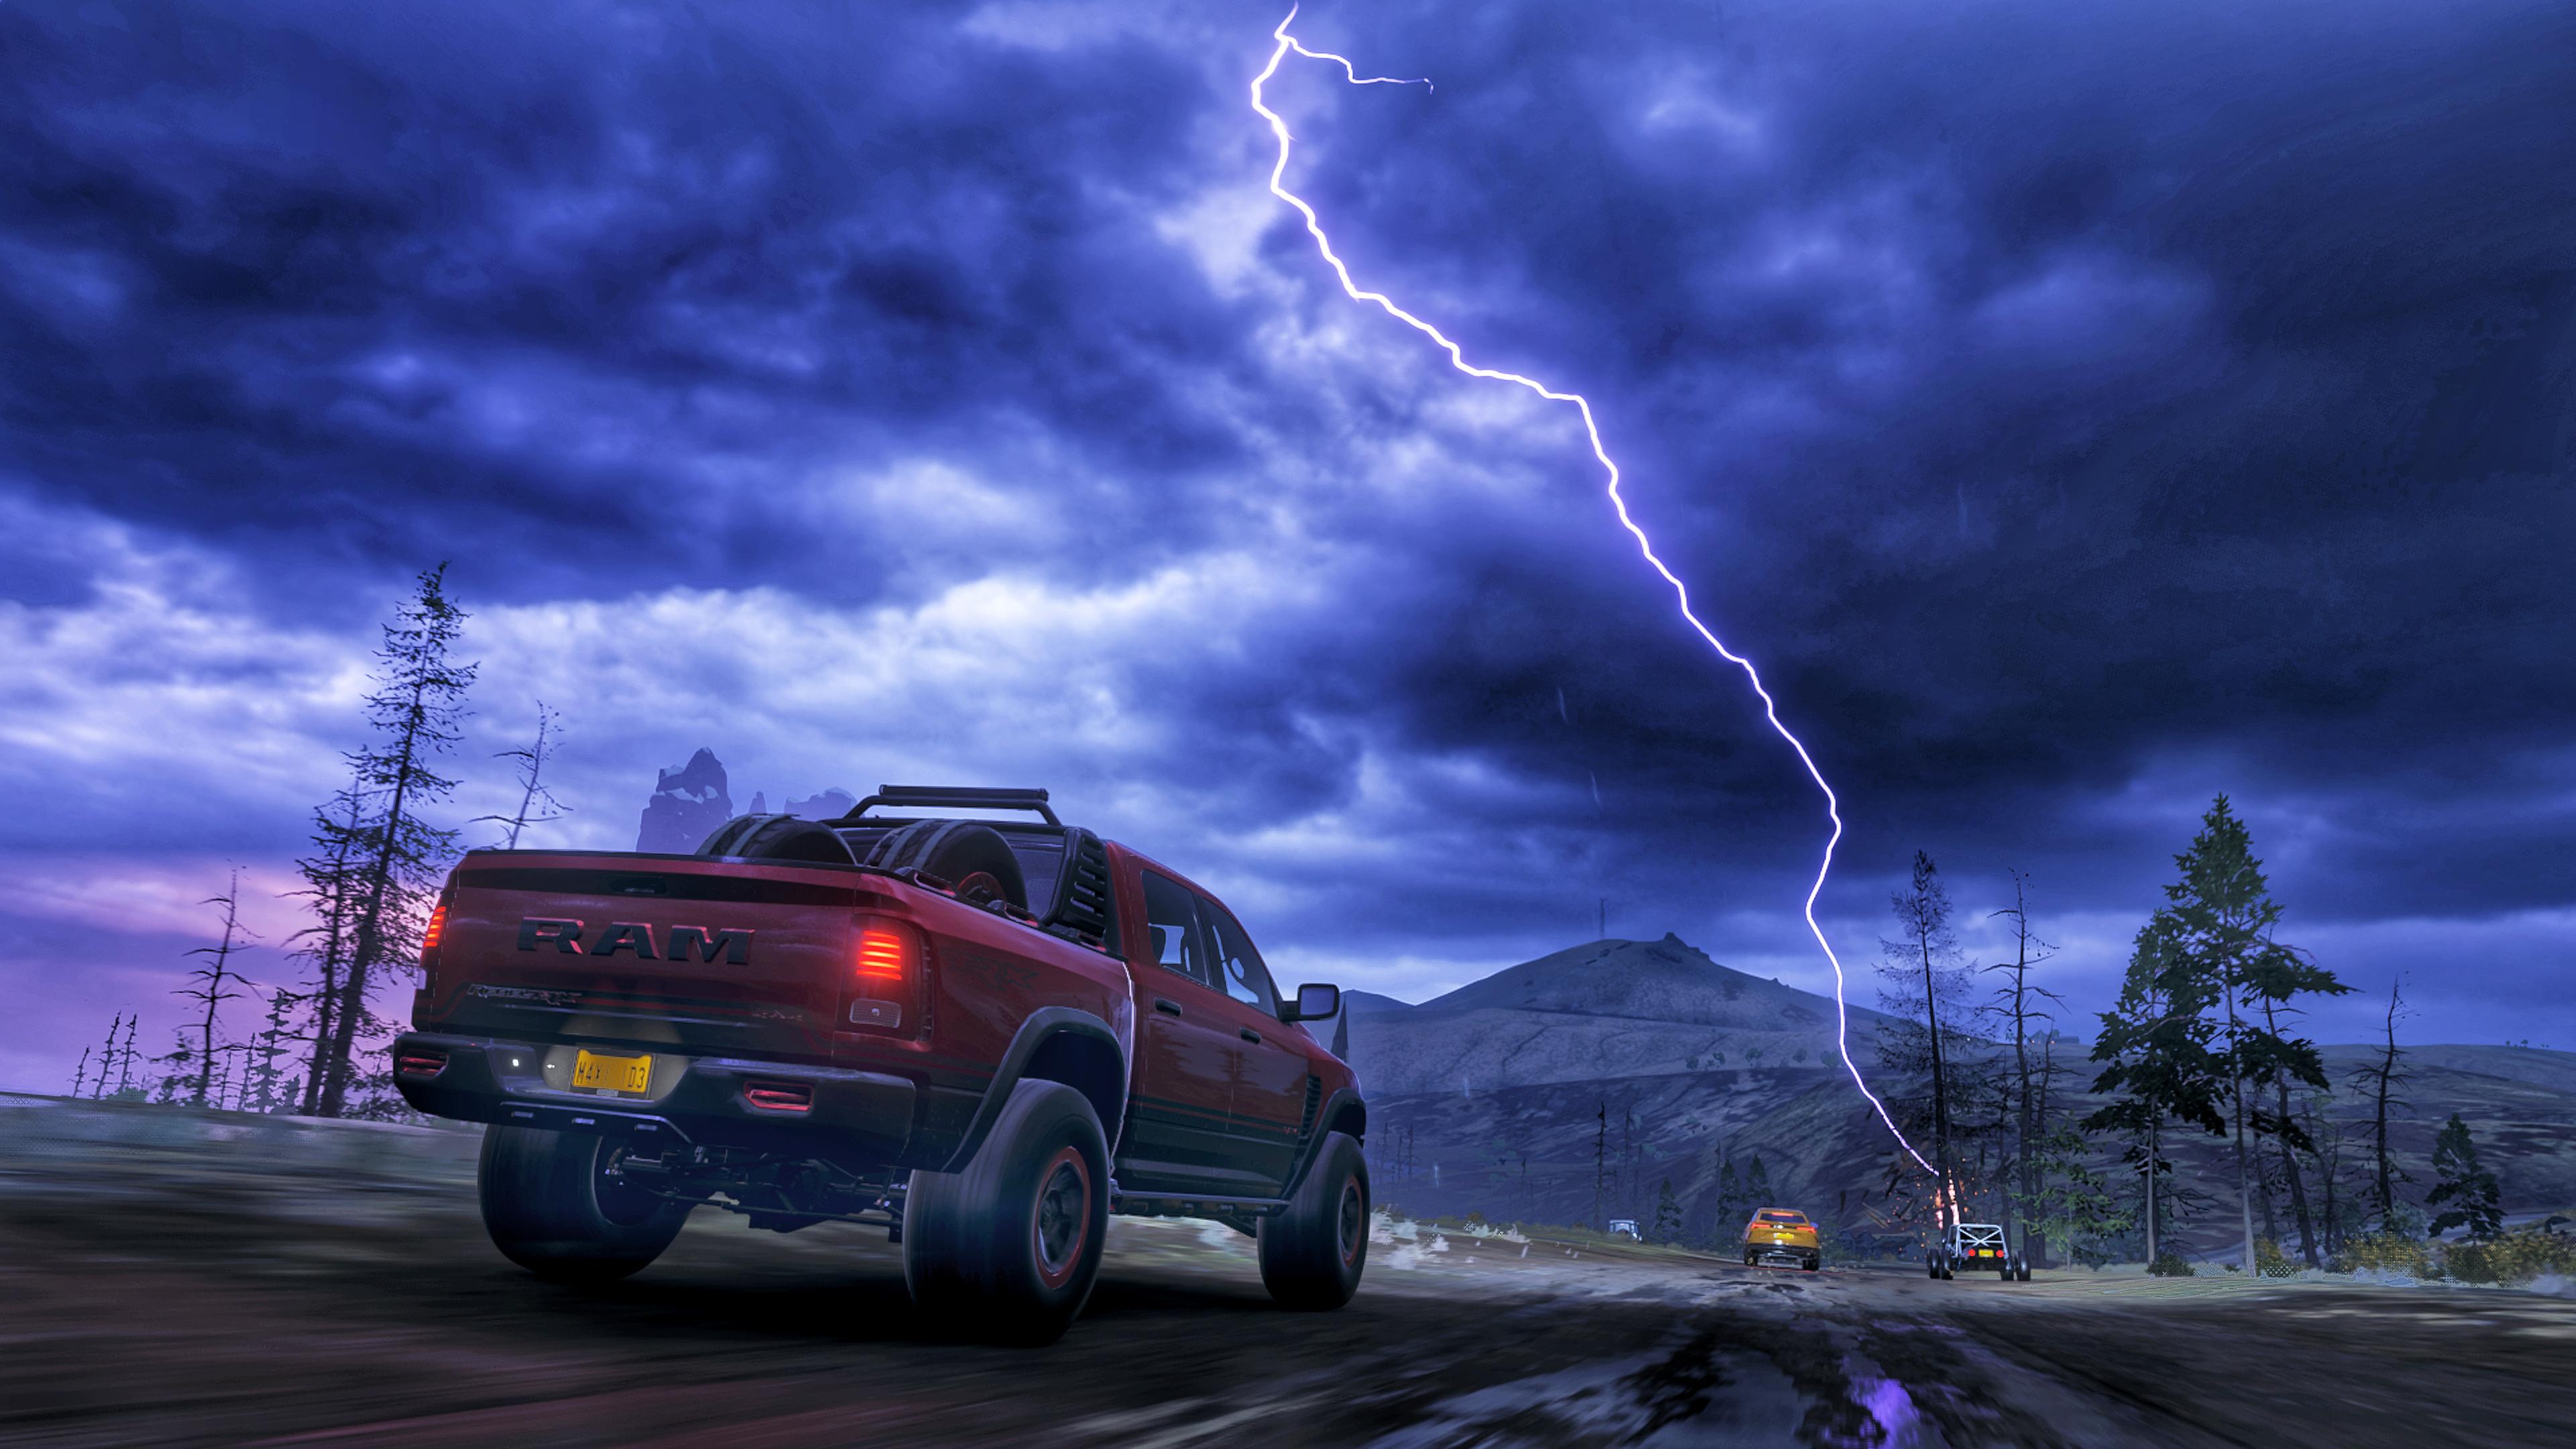 Forza Forza Horizon 4 Fortune Island Truck Pickup Trucks Dodge Dodge RAM Storm Lightning 3840x2160